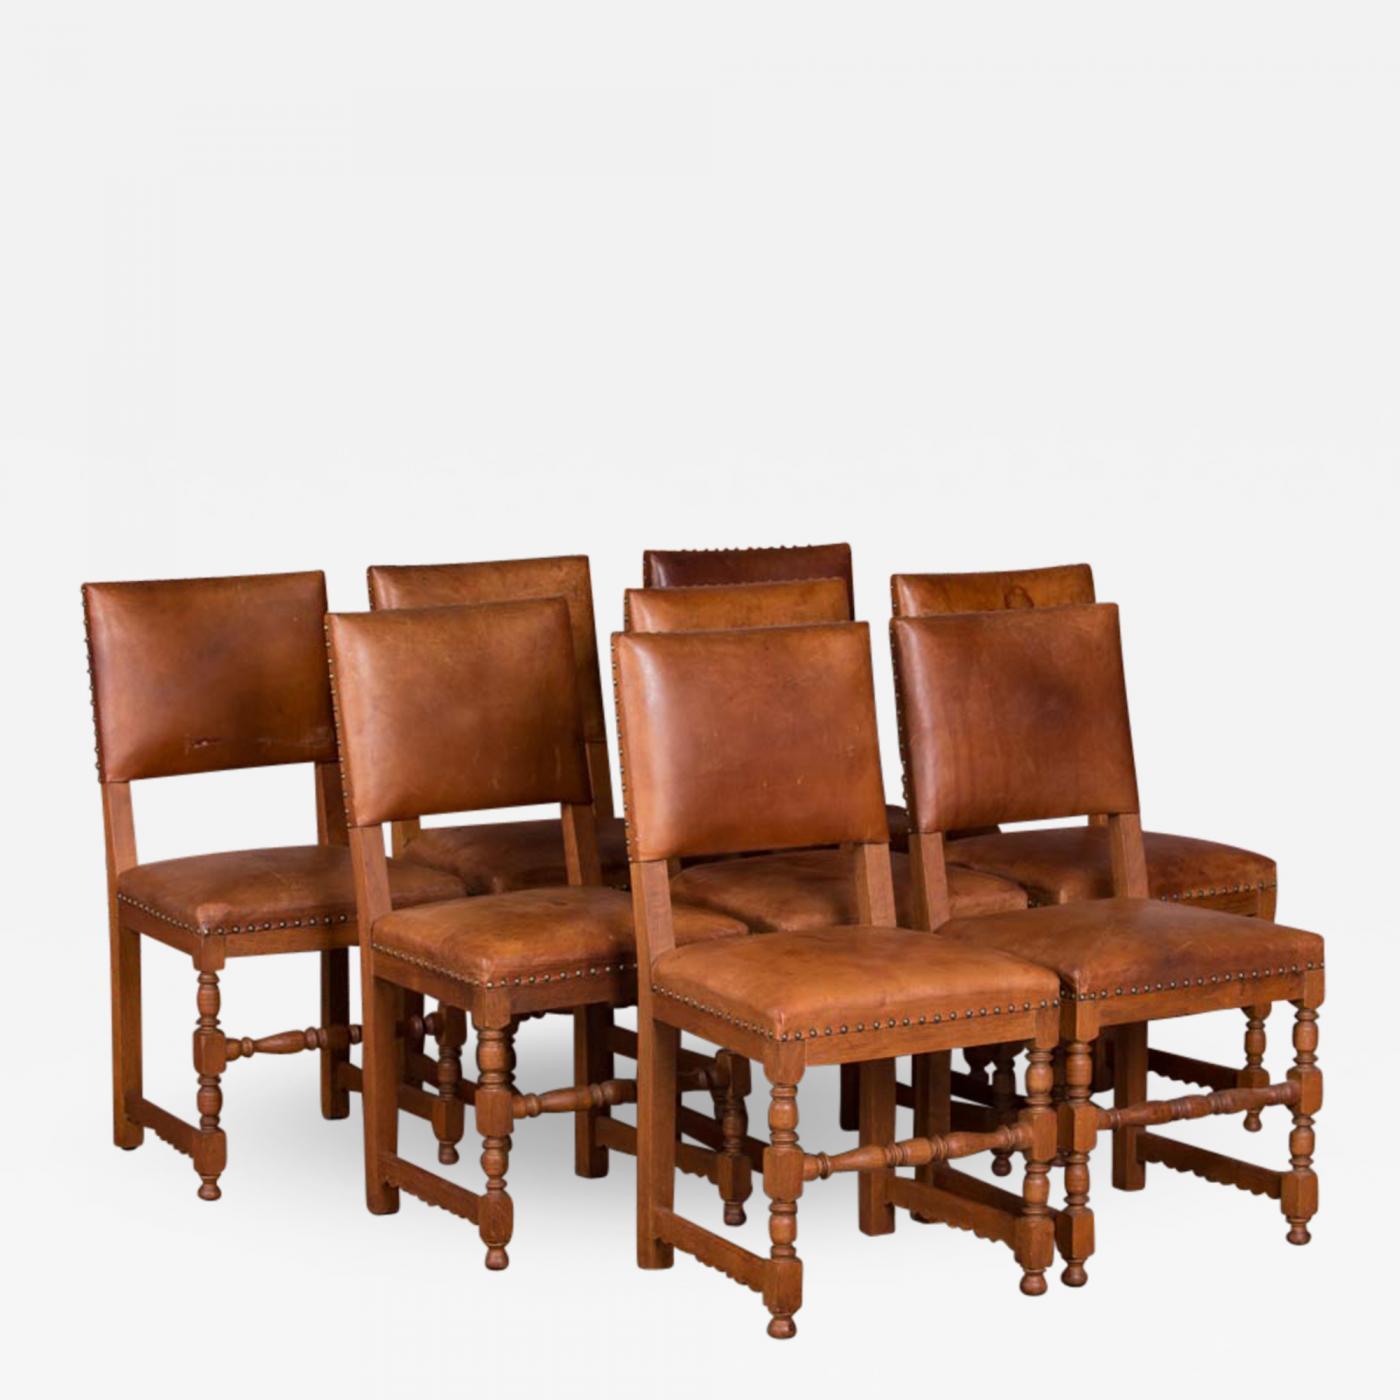 Enjoyable Set Of 8 Antique Danish Oak And Leather Dining Chairs Creativecarmelina Interior Chair Design Creativecarmelinacom